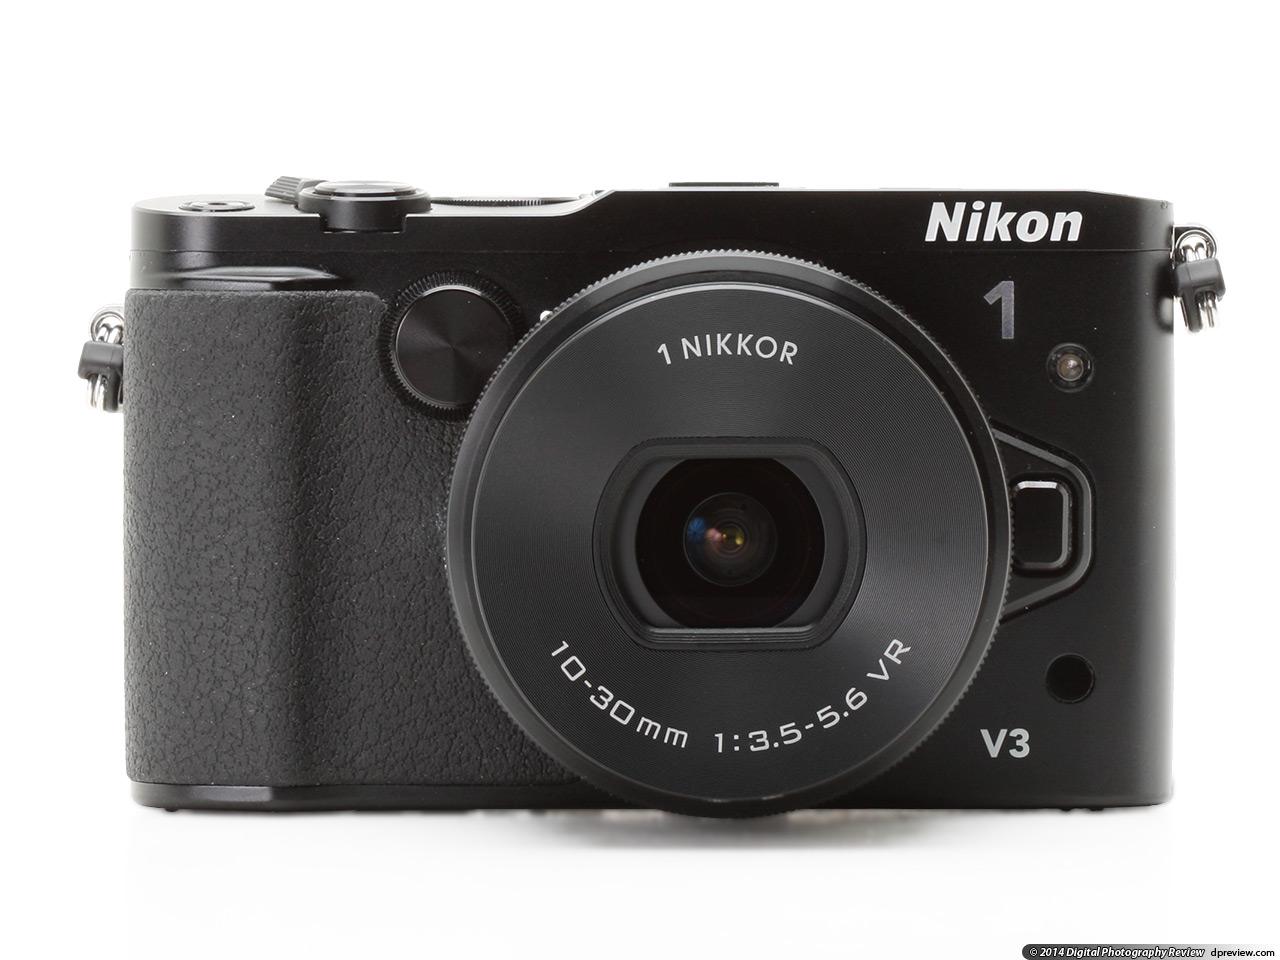 Nikon 1 V3 Review: Digital Photography Review